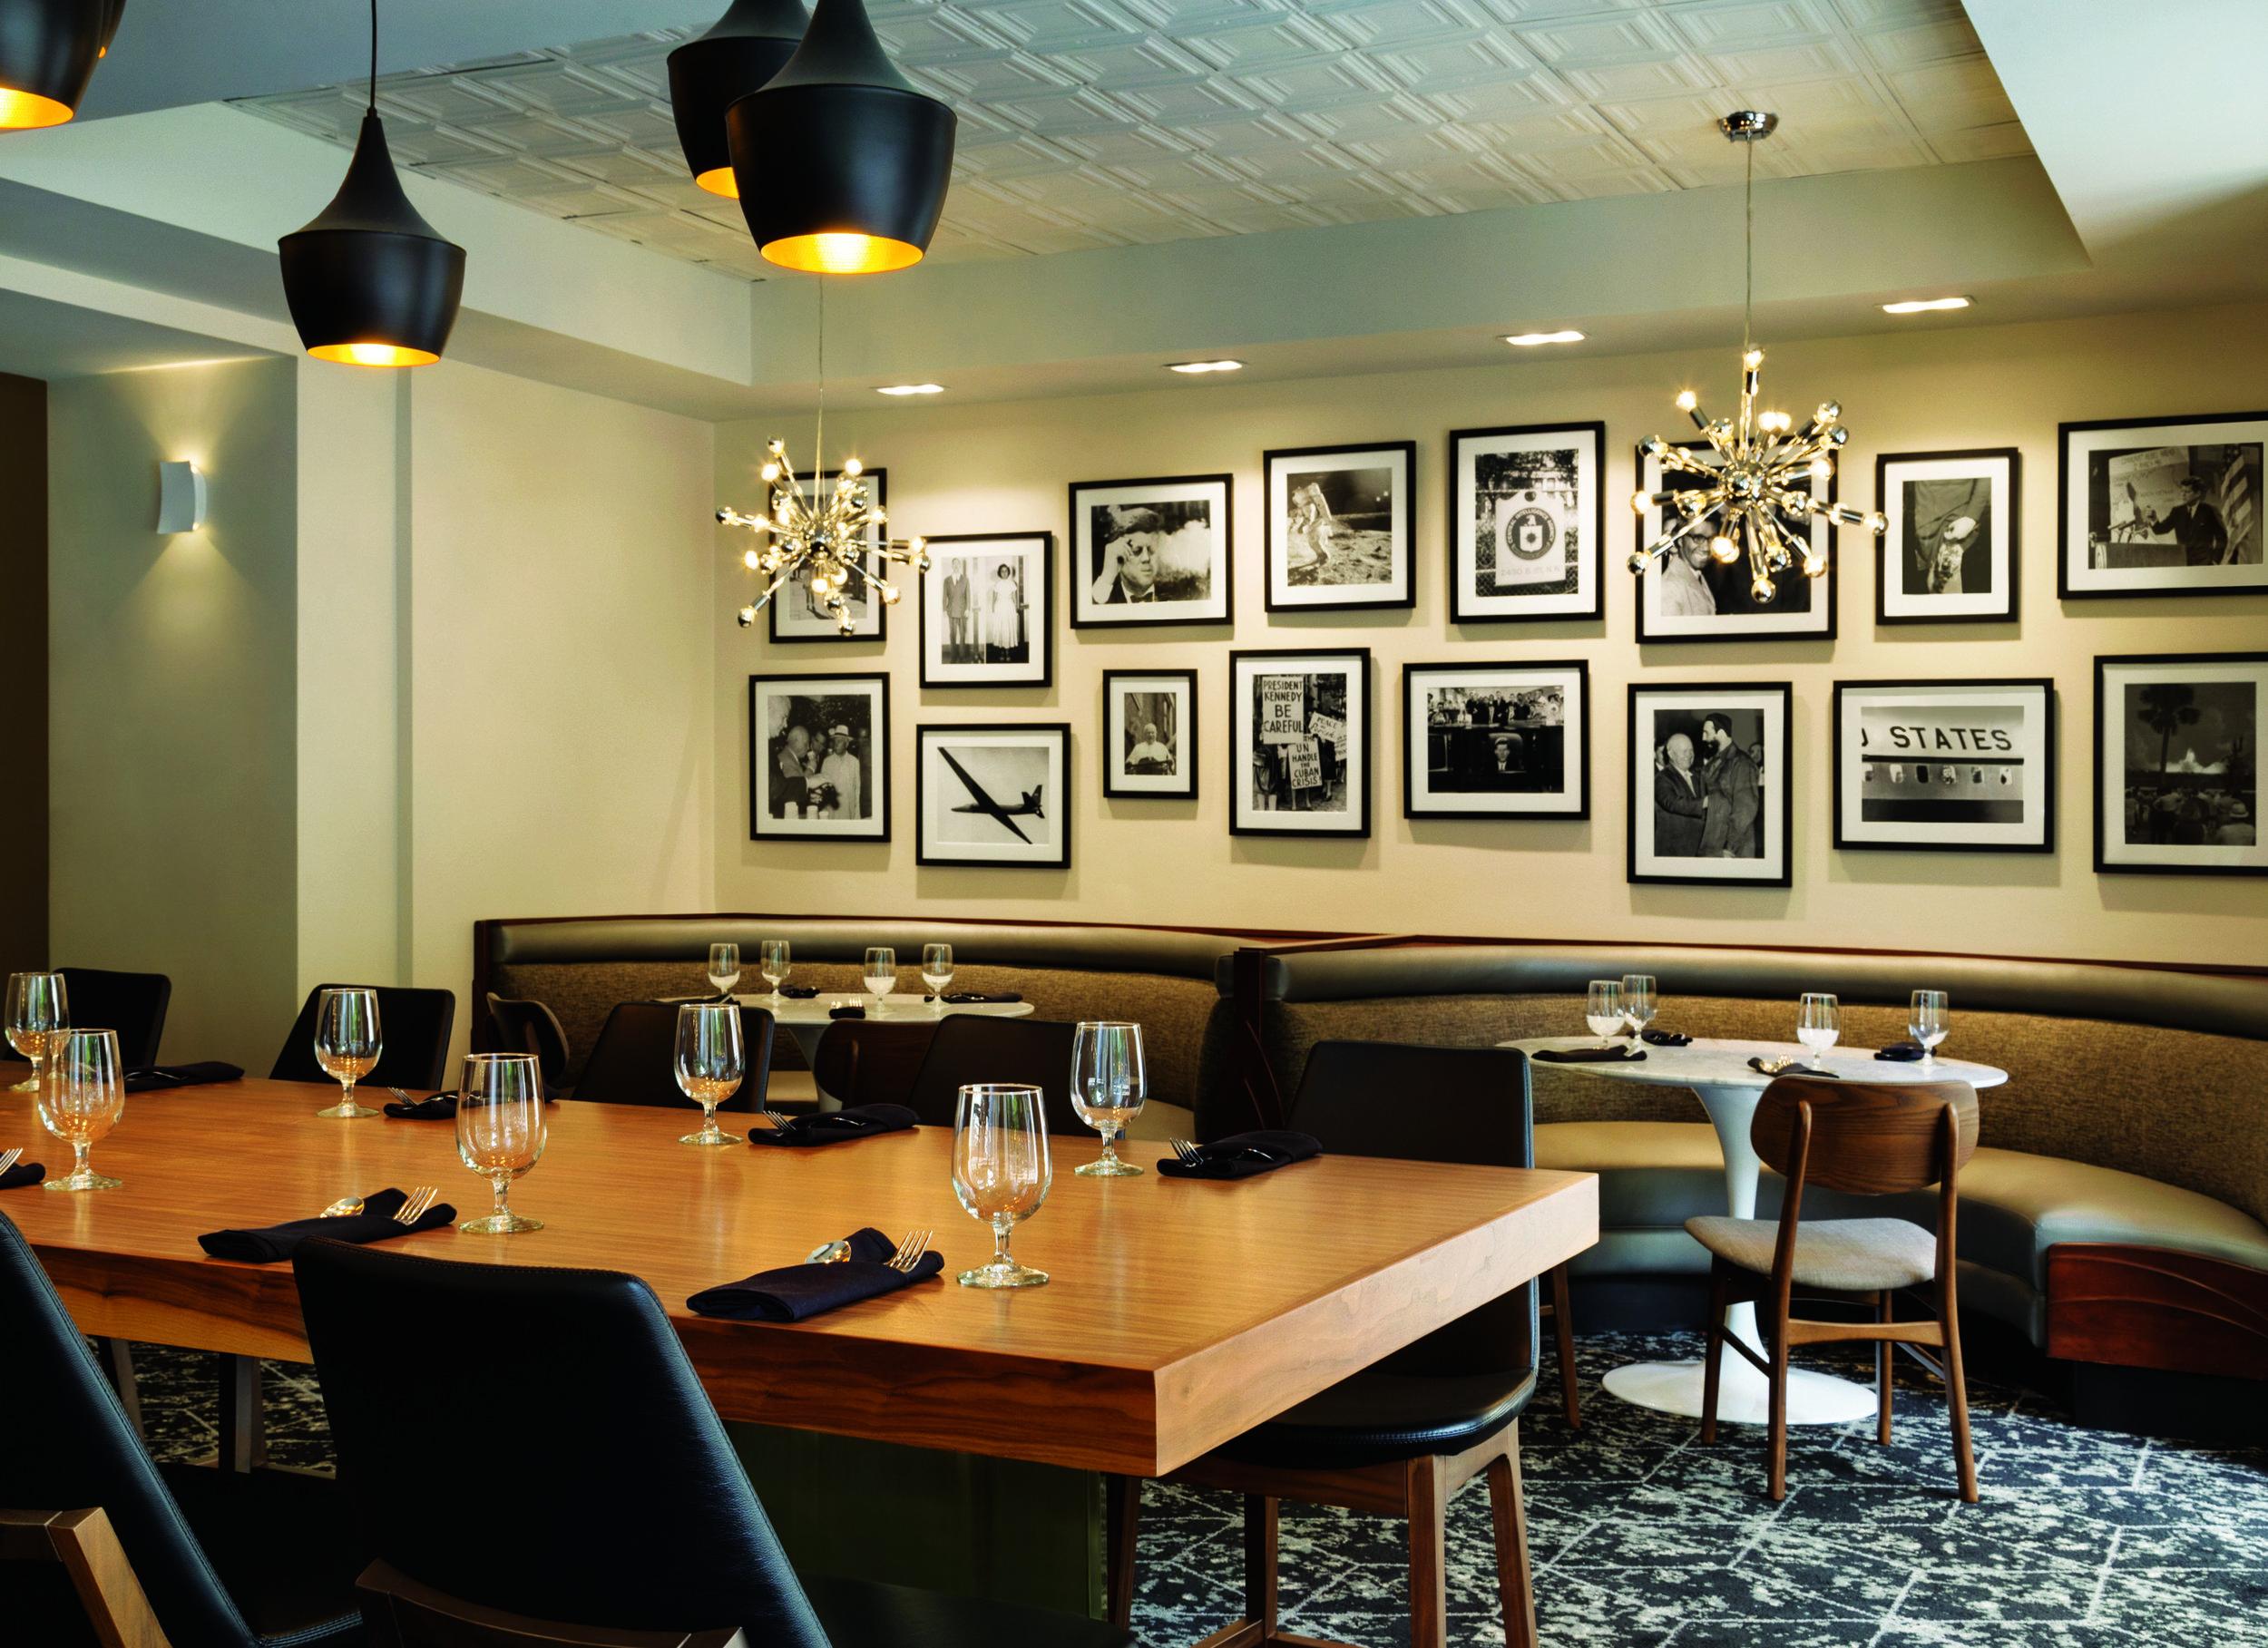 ATLSS_Restaurant 01_edit.jpg